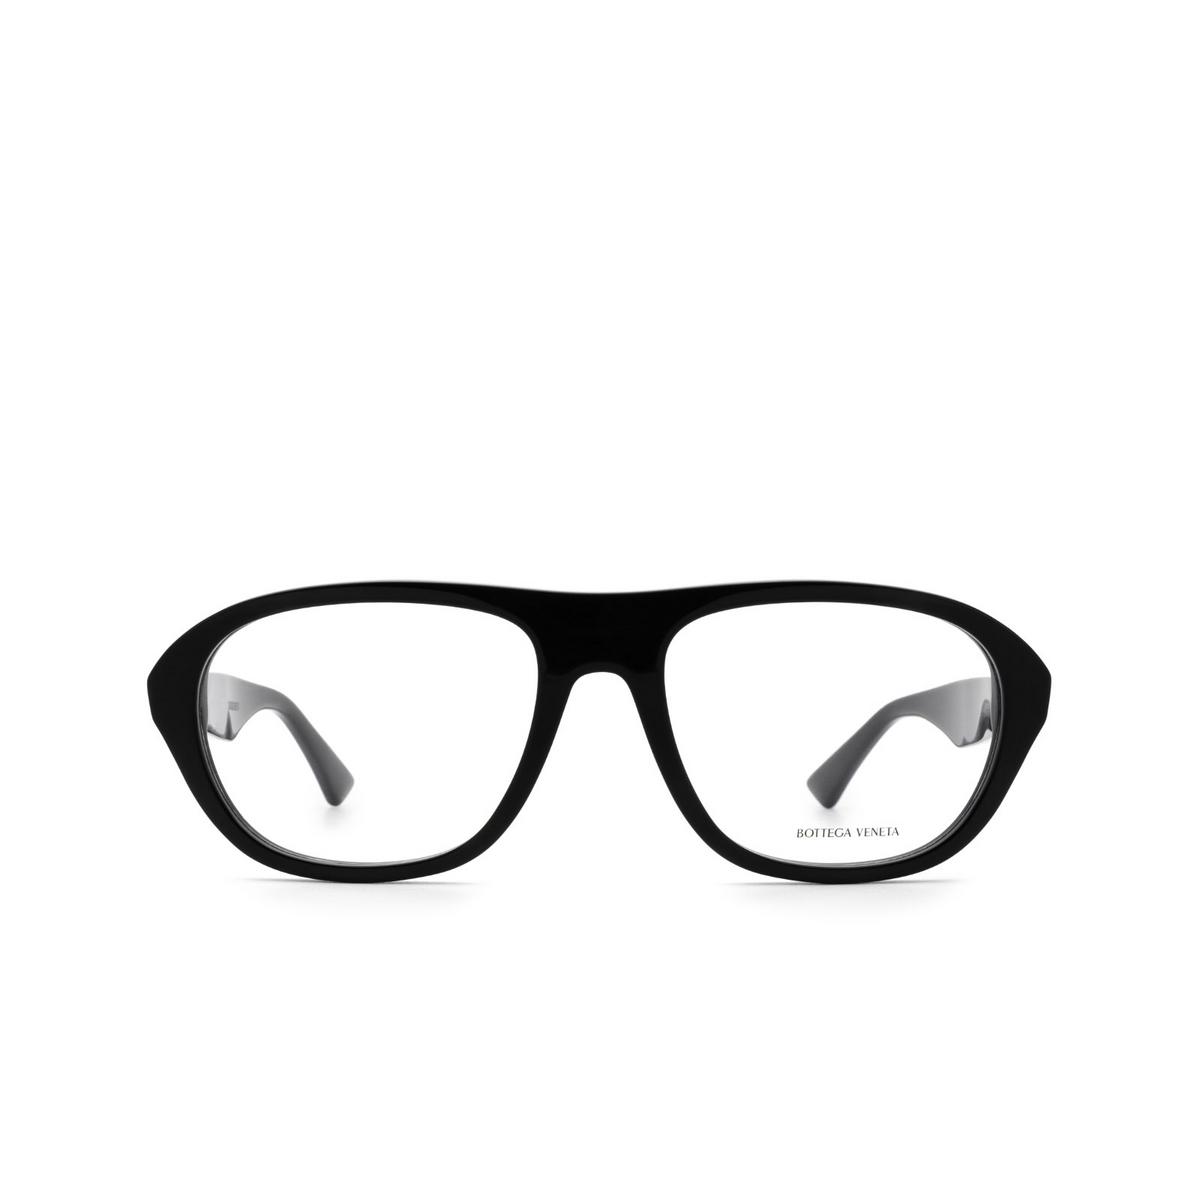 Bottega Veneta® Rectangle Eyeglasses: BV1131O color Black 001 - front view.